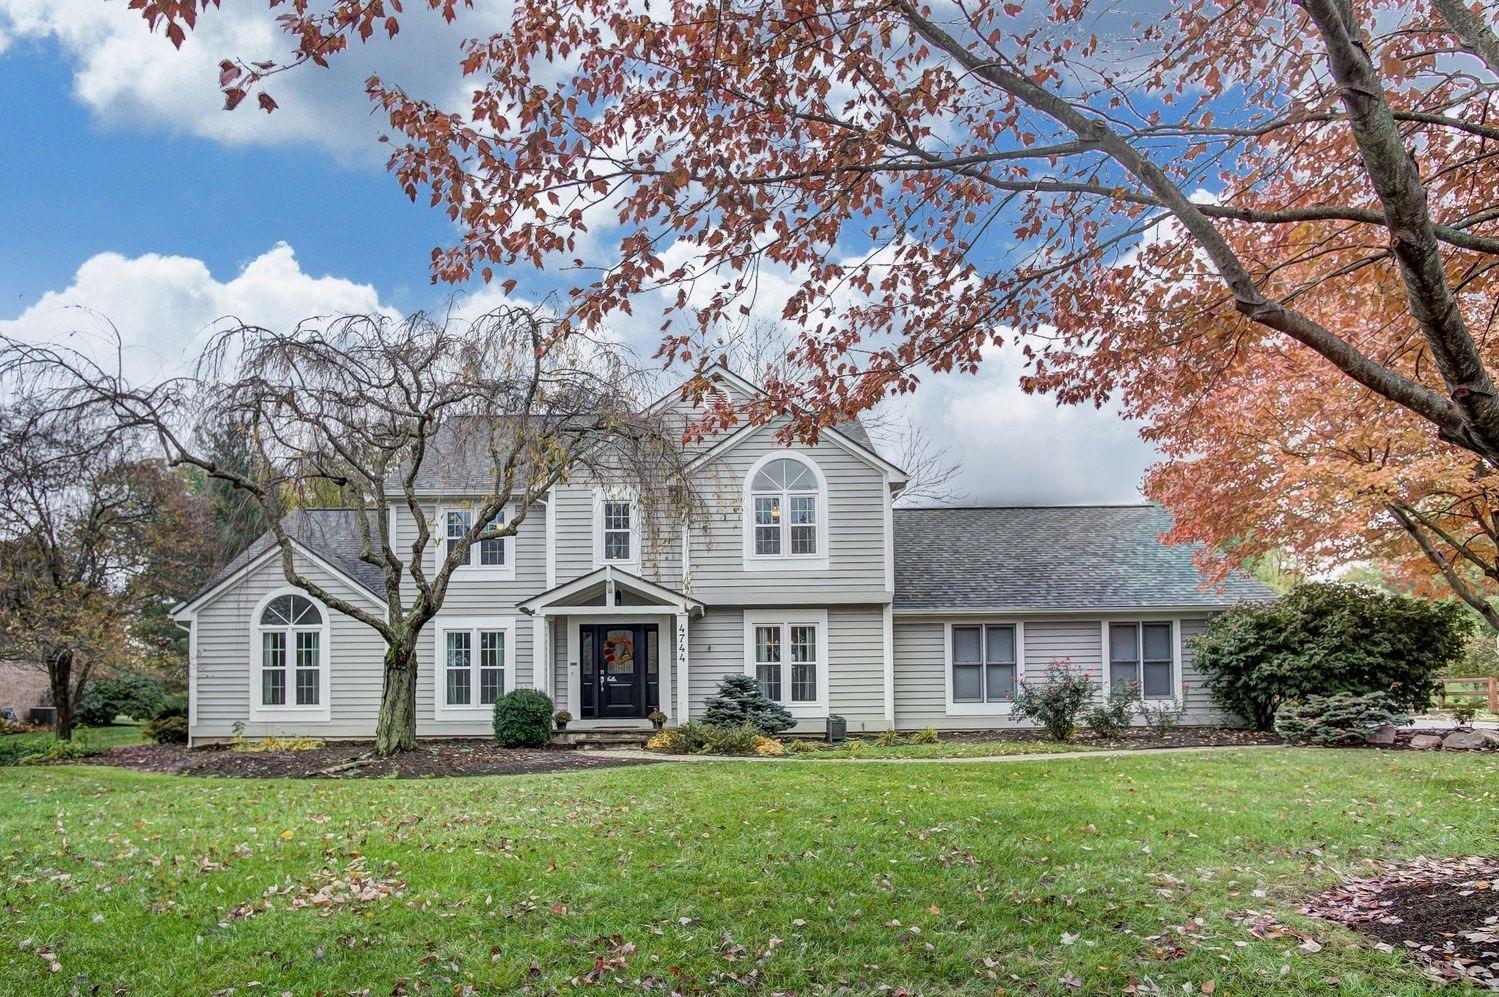 Property for sale at 4744 Appaloosa Trail, Mason,  OH 45040